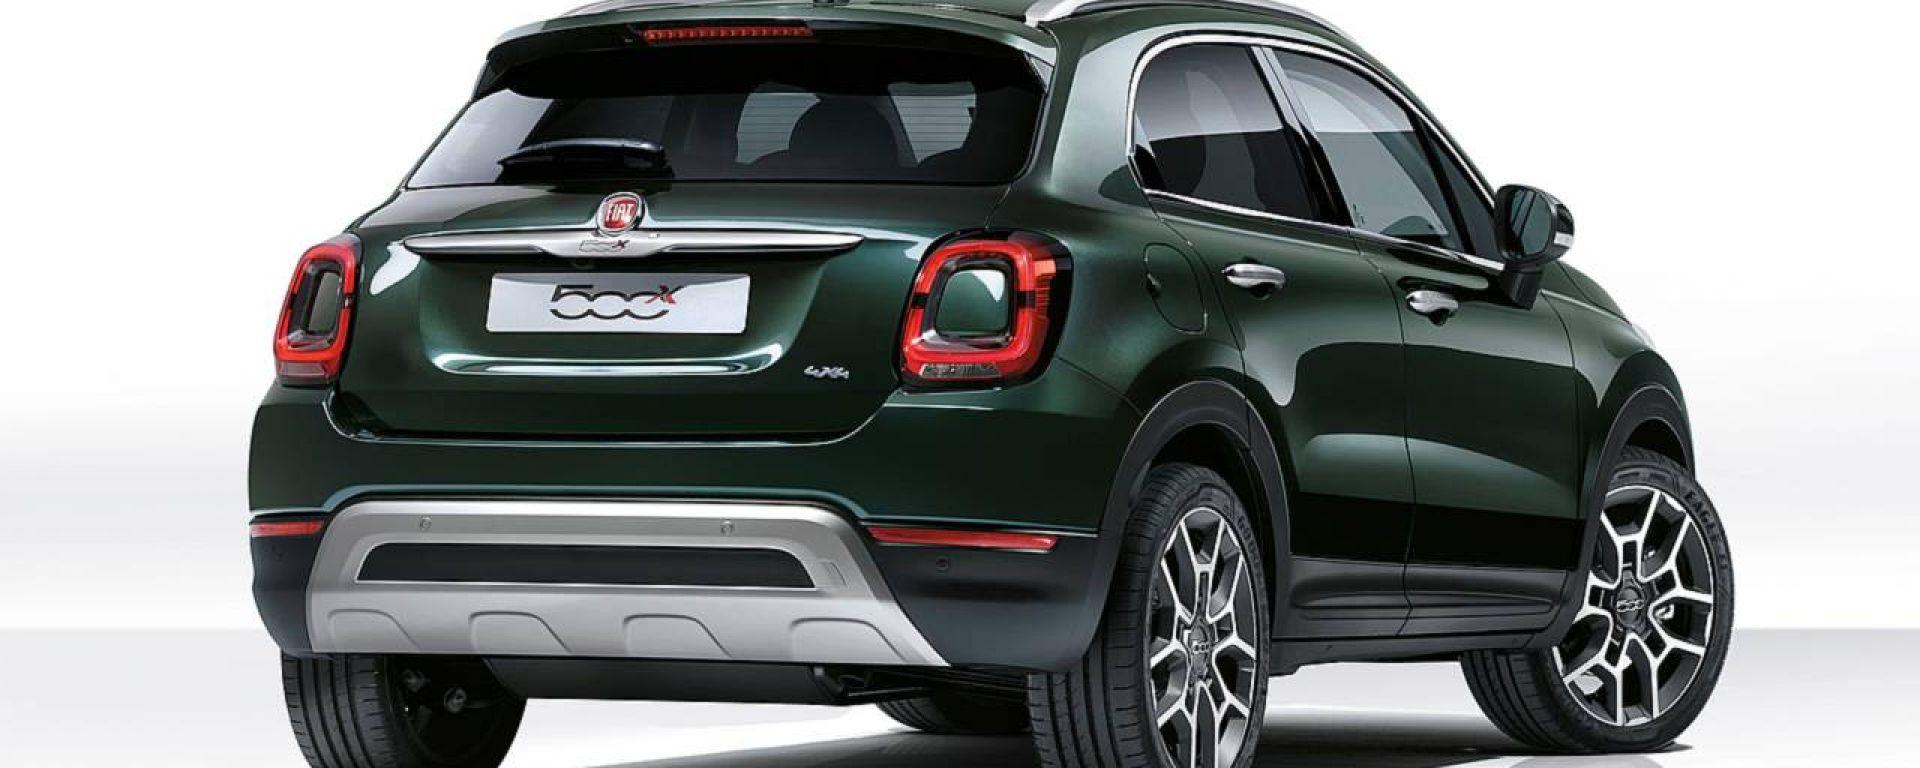 Fiat 500X 2019: vista 3/4 posteriore